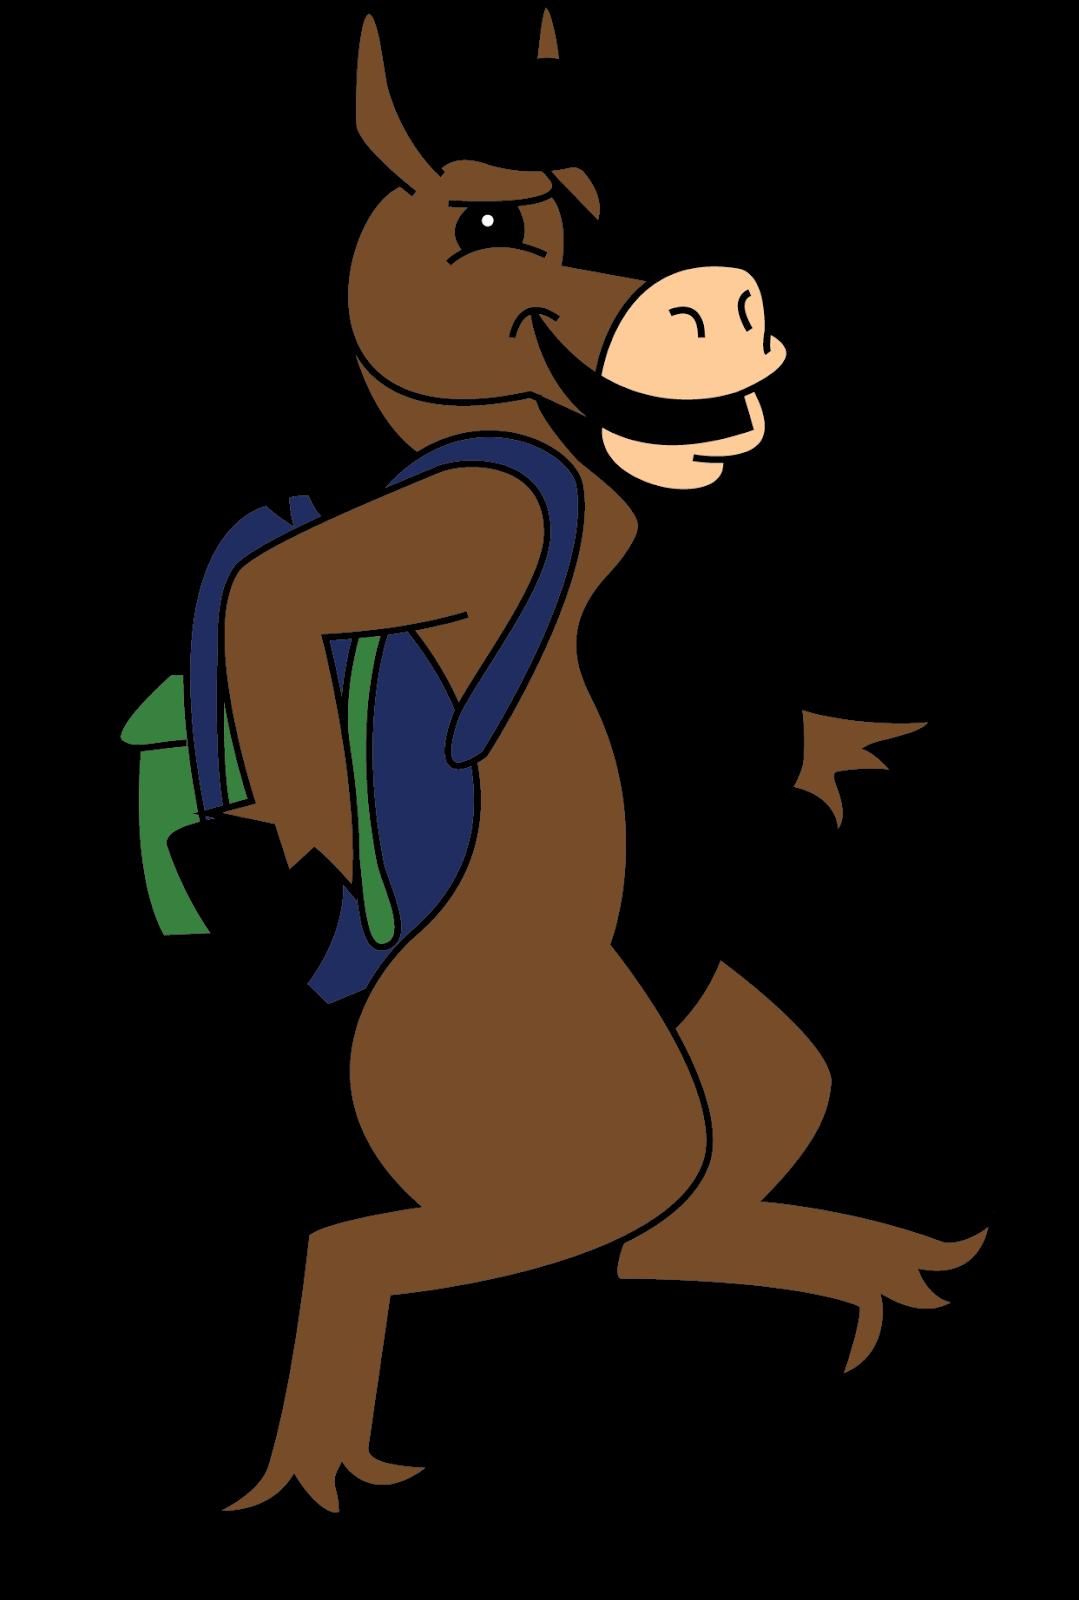 Buddy Bronco roj mascot